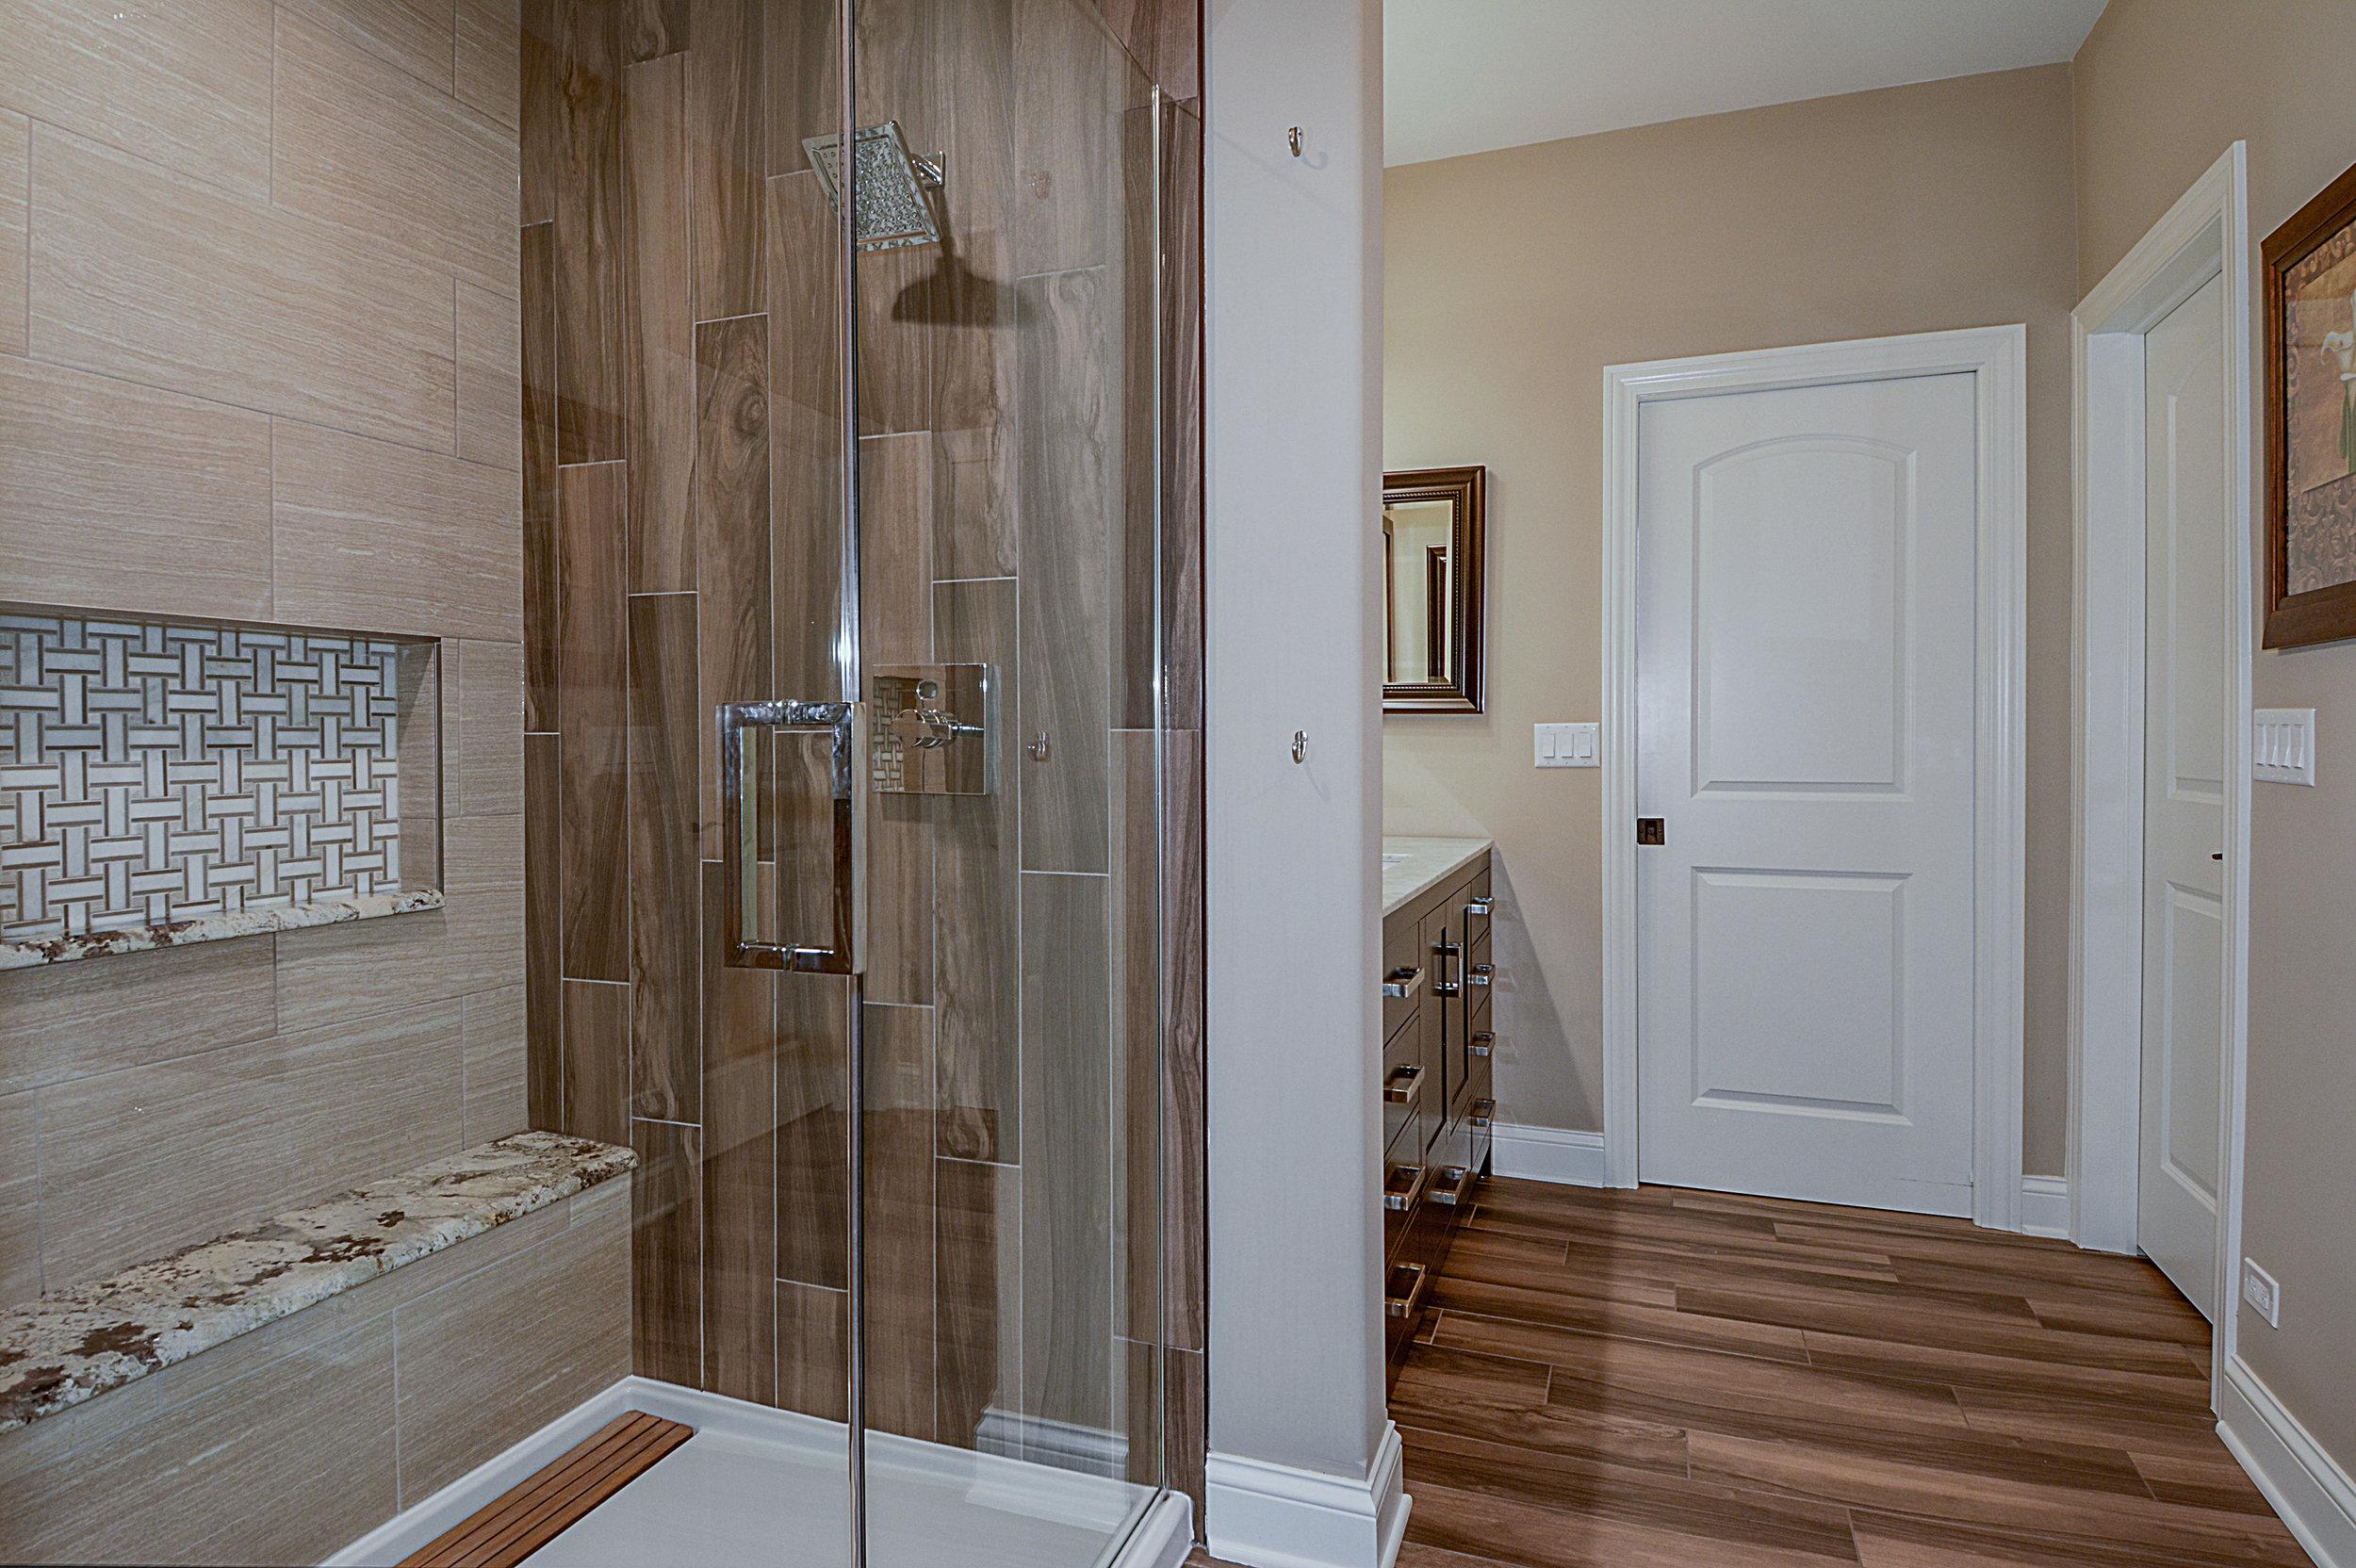 Bathroom Remodel in Geneva IL with Hardwood Tile in Shower